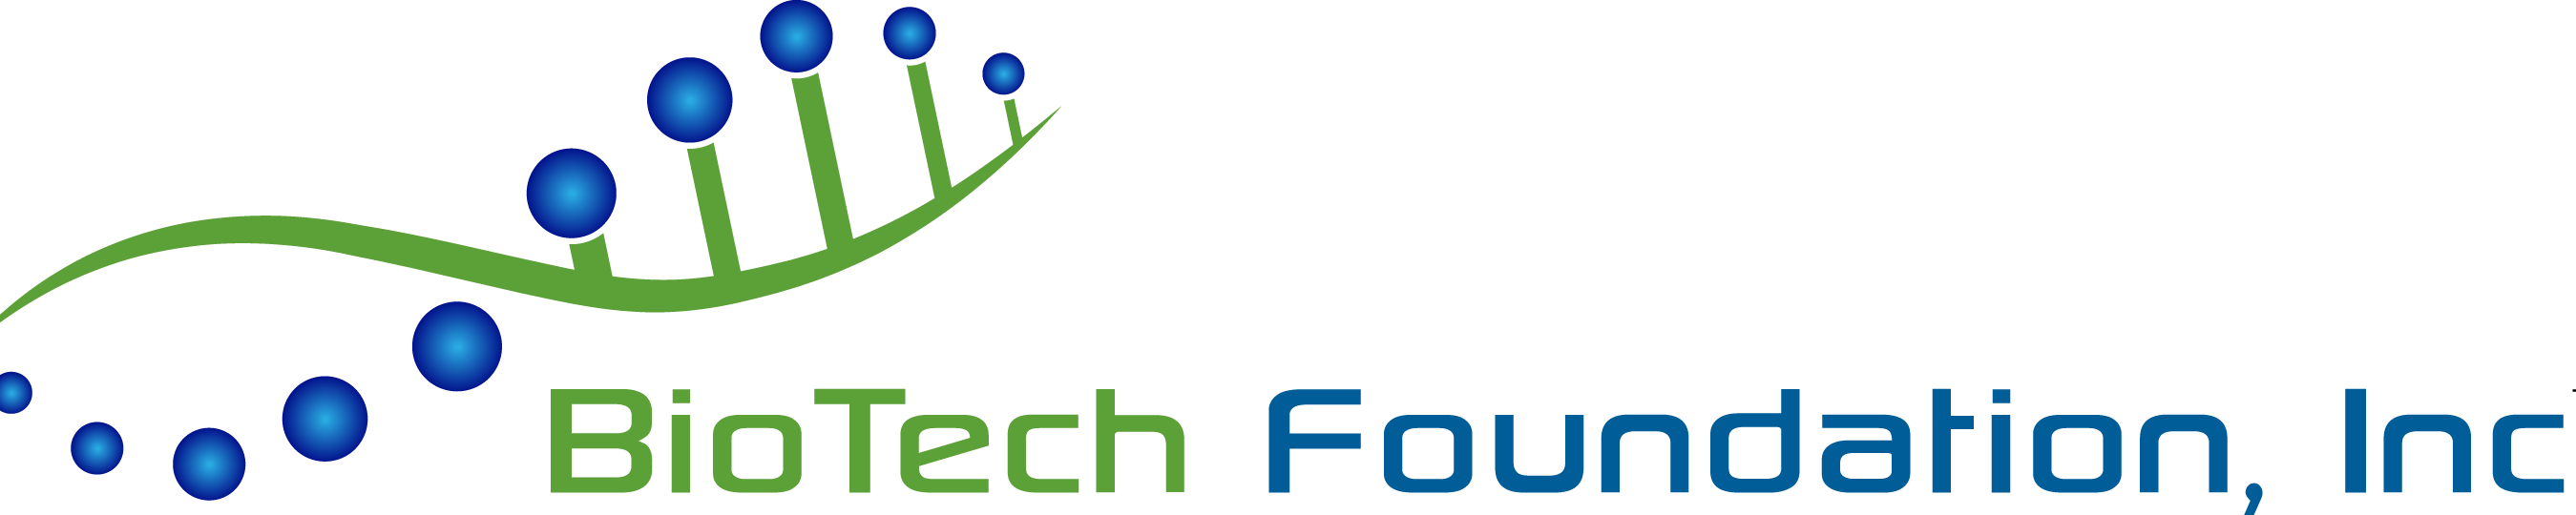 BioTech Foundation, Inc.